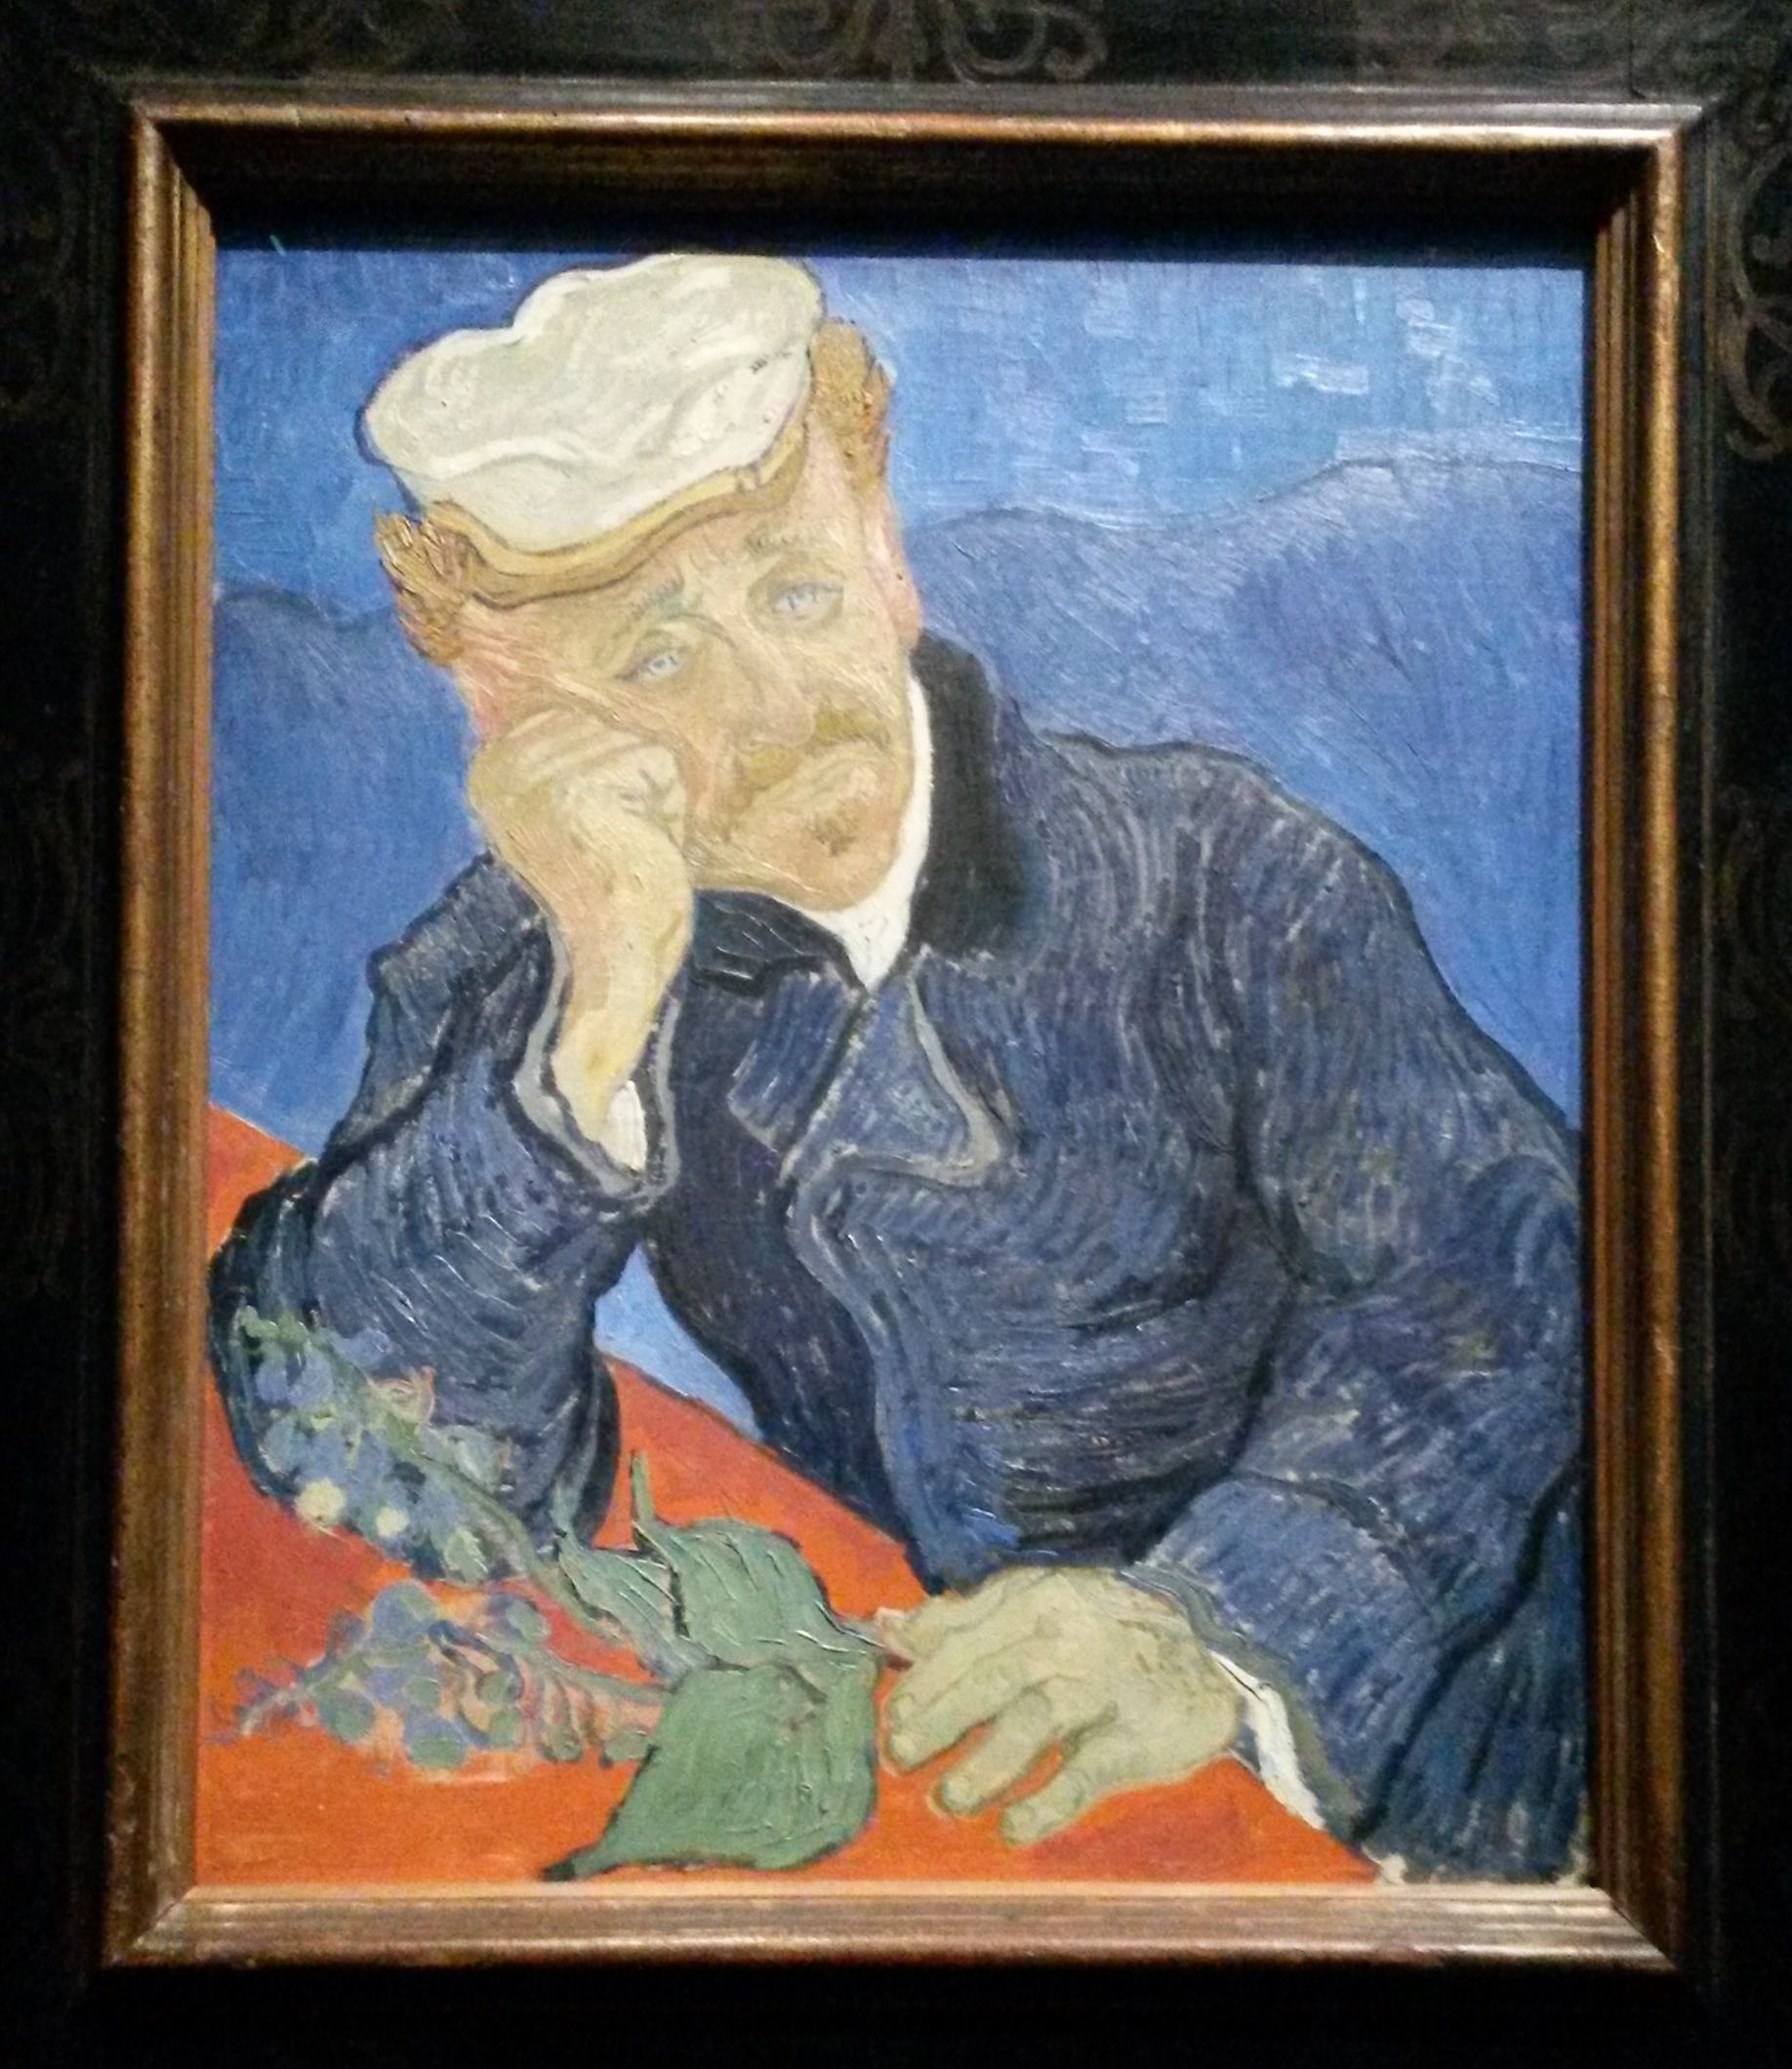 Retrato de Dr. Gachet